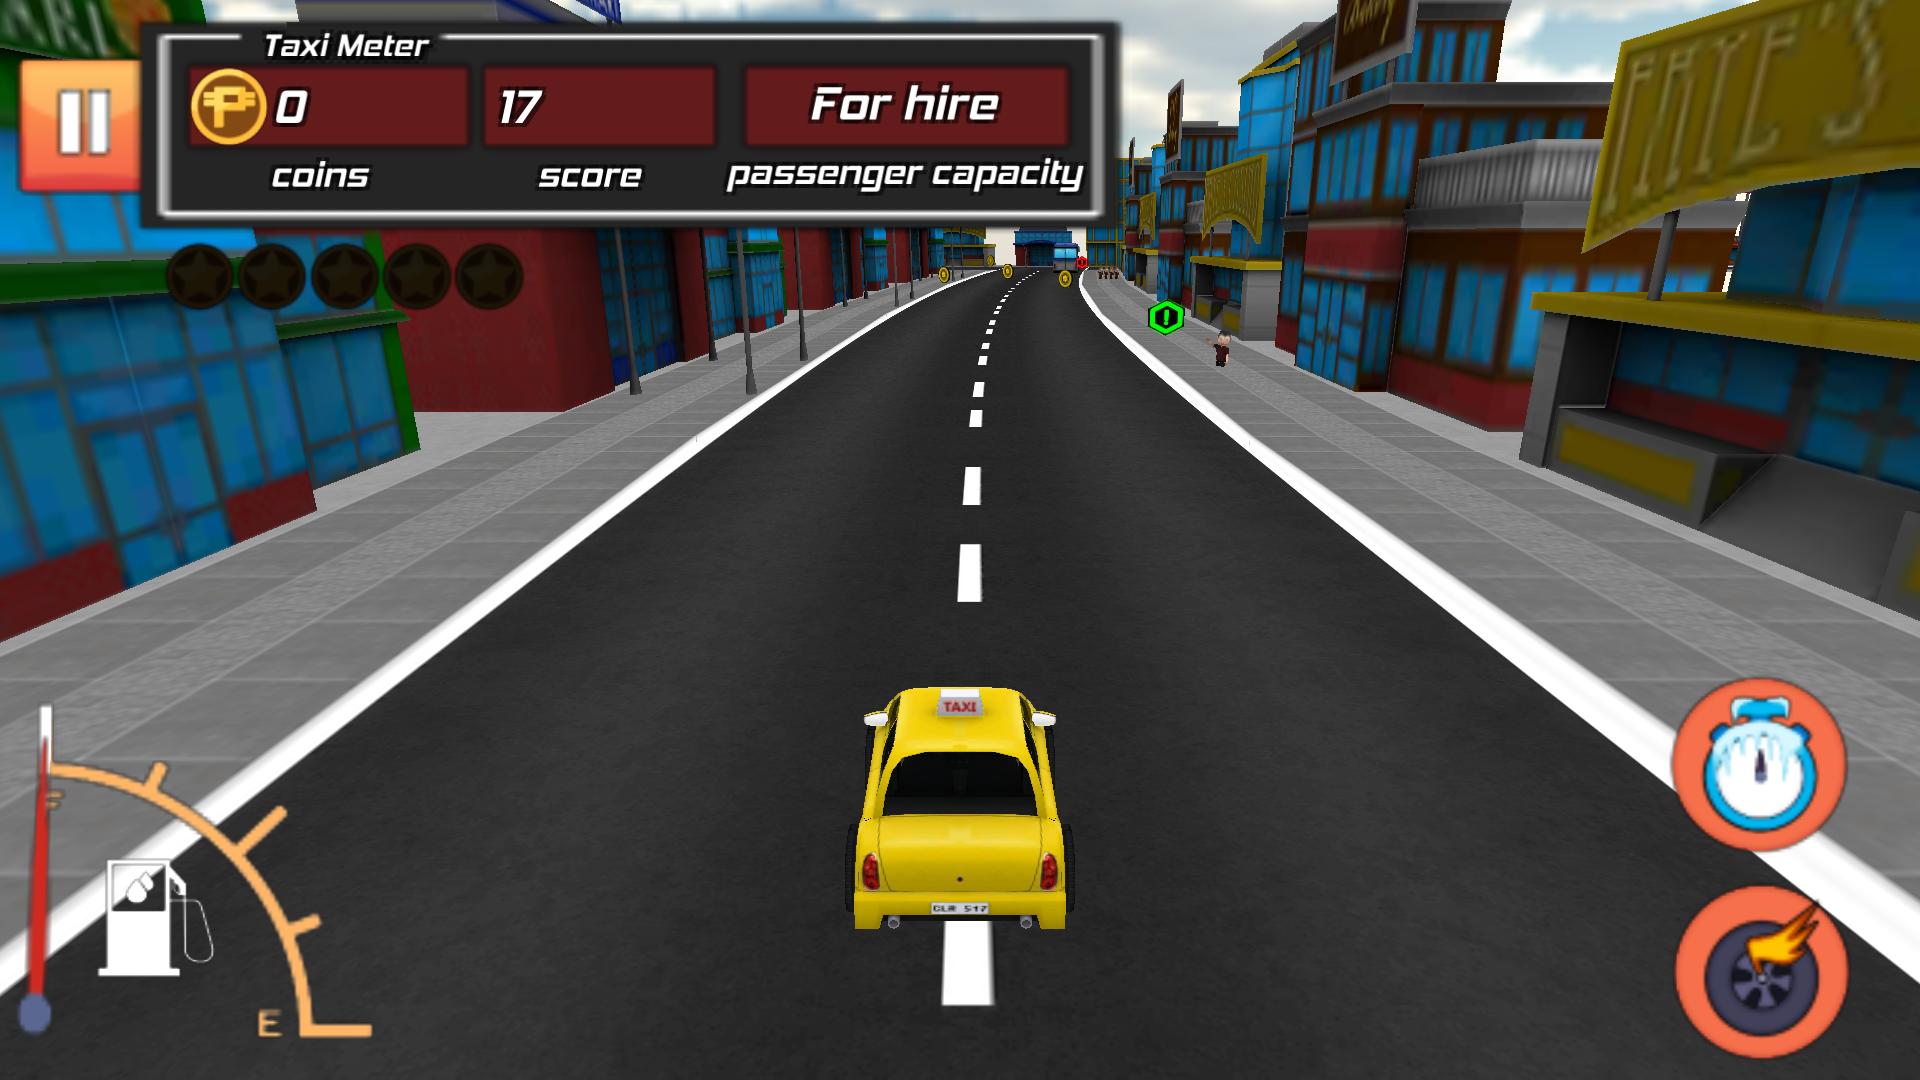 Epic Taxi Run